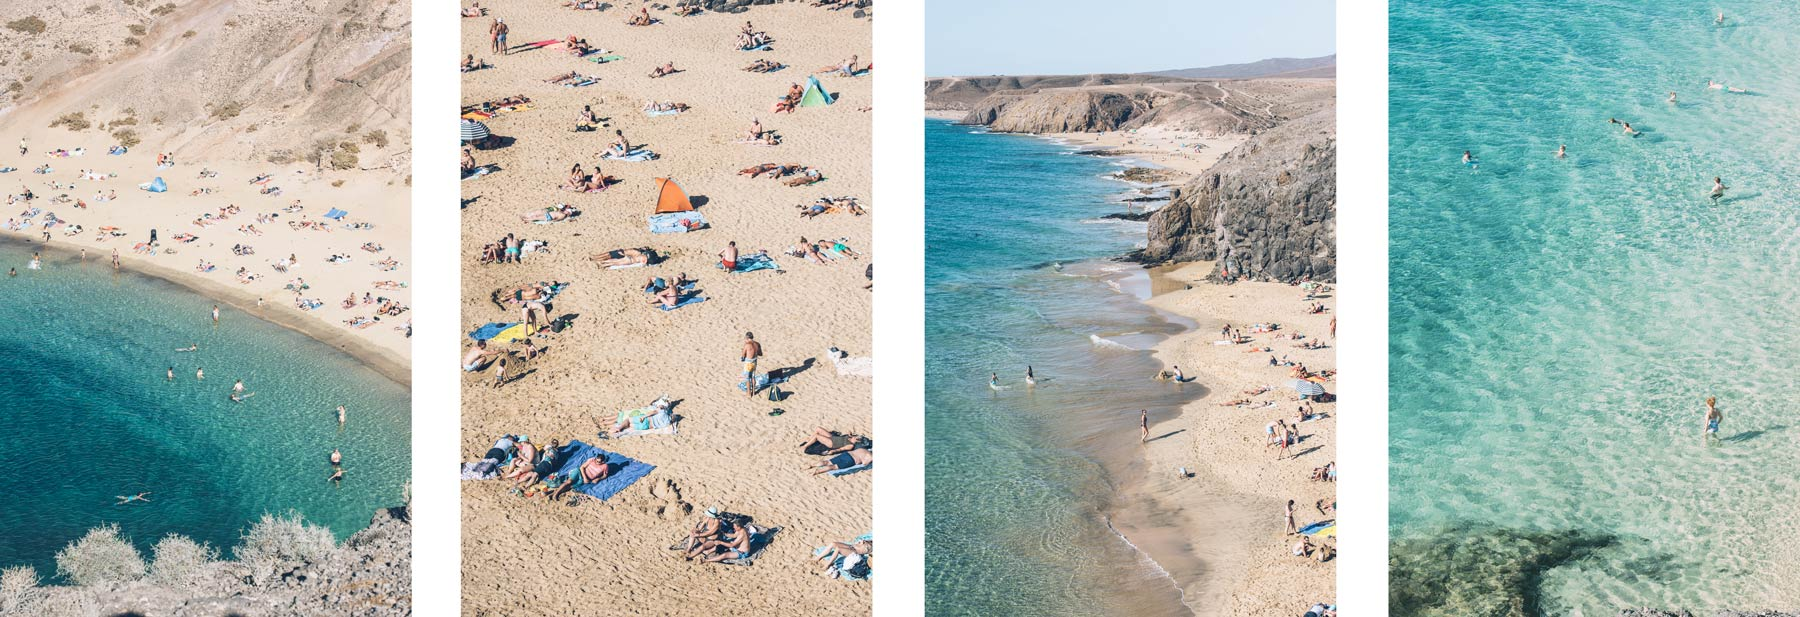 Plage Turquoise Lanzarote: Papagayo